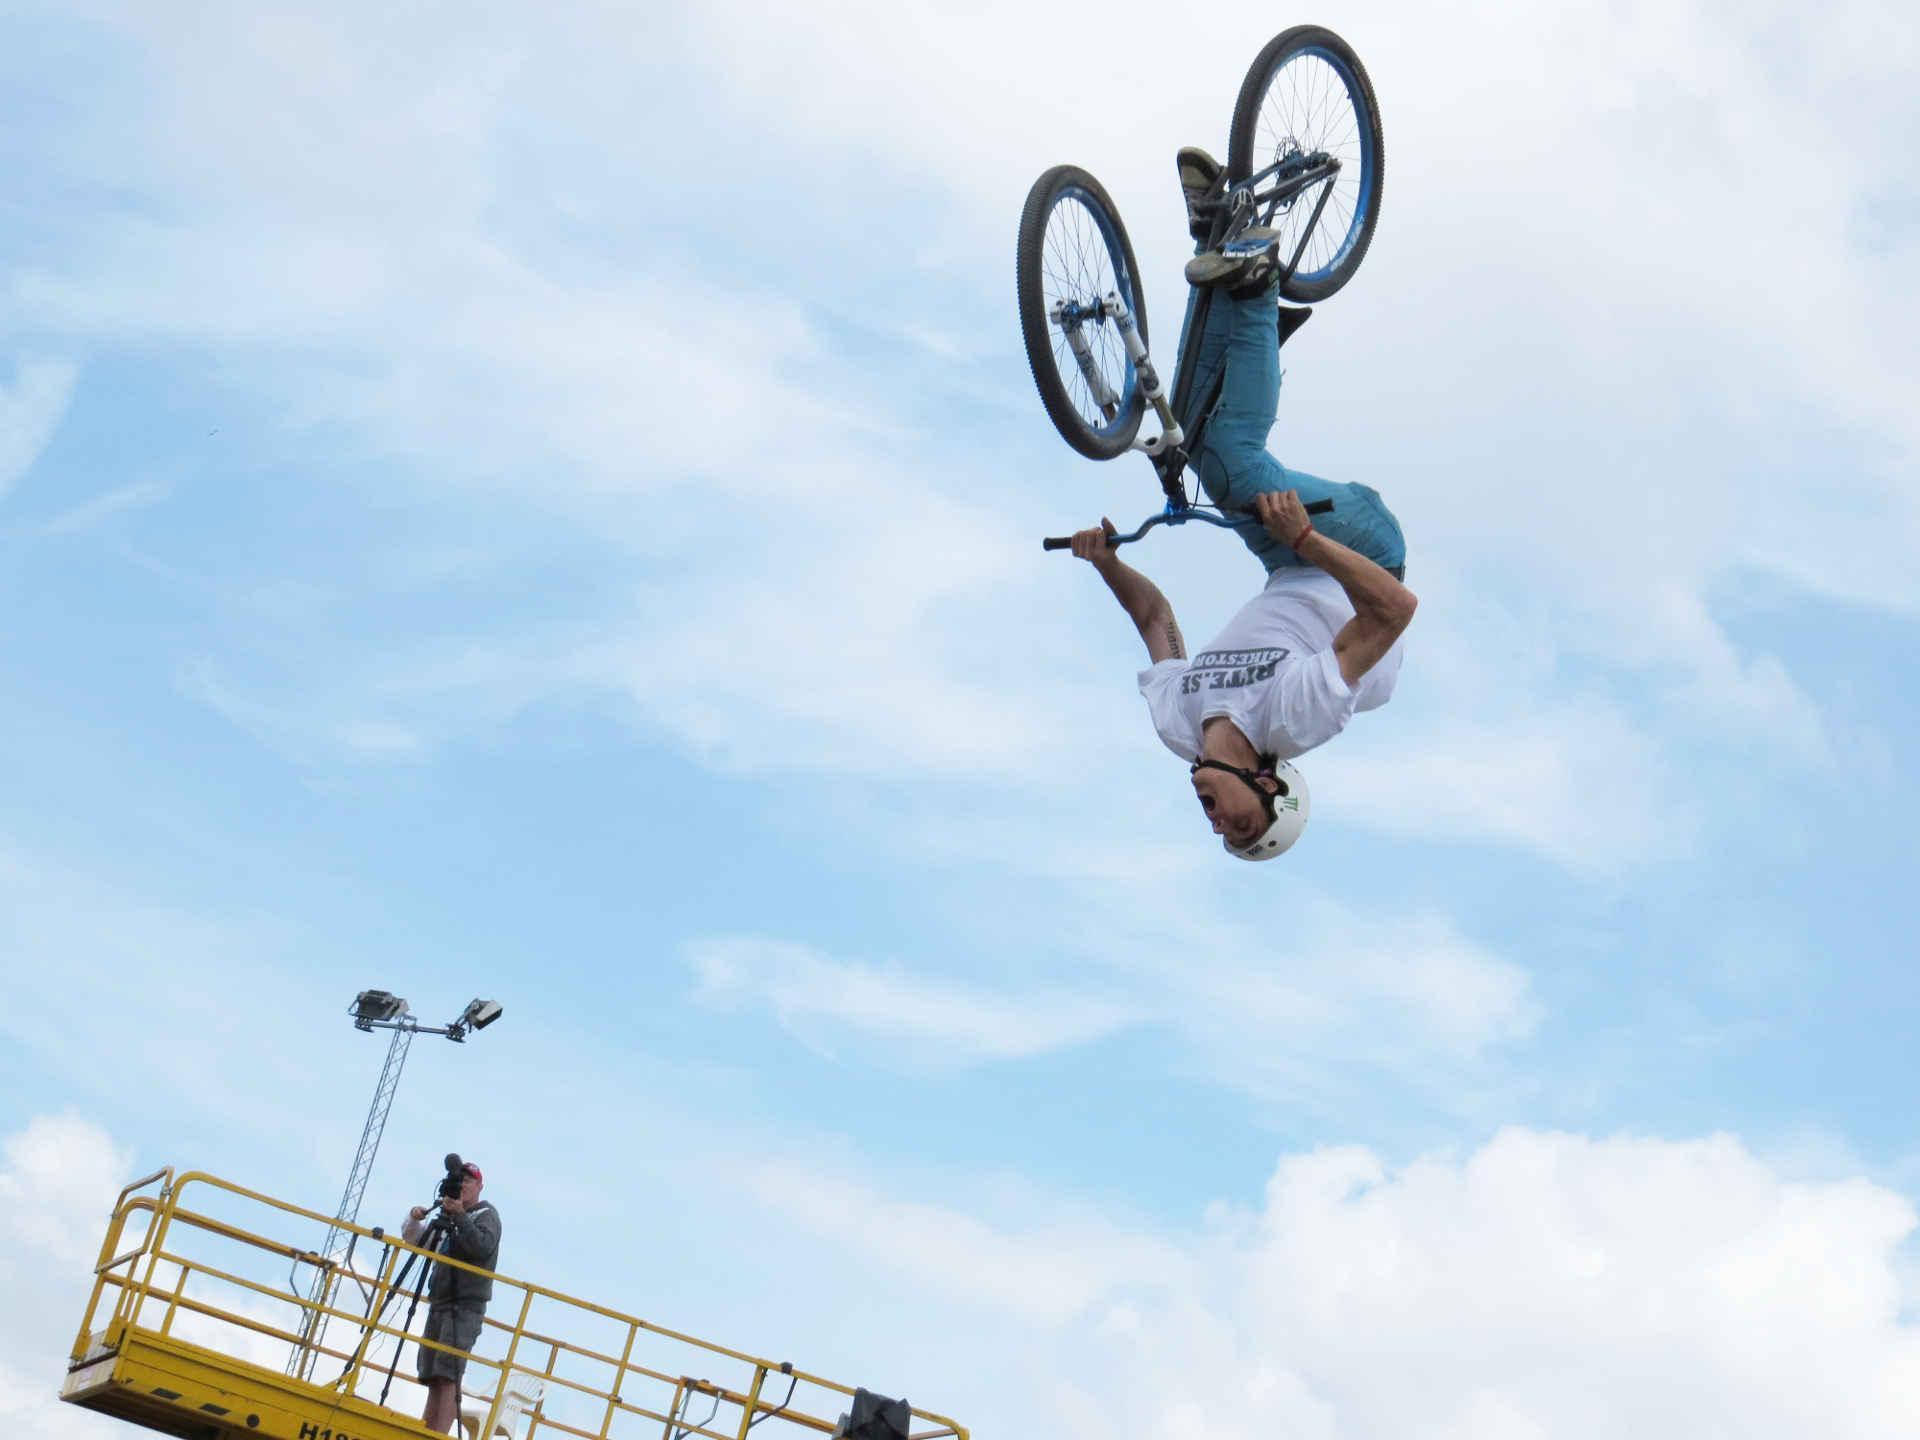 Bicycle jump